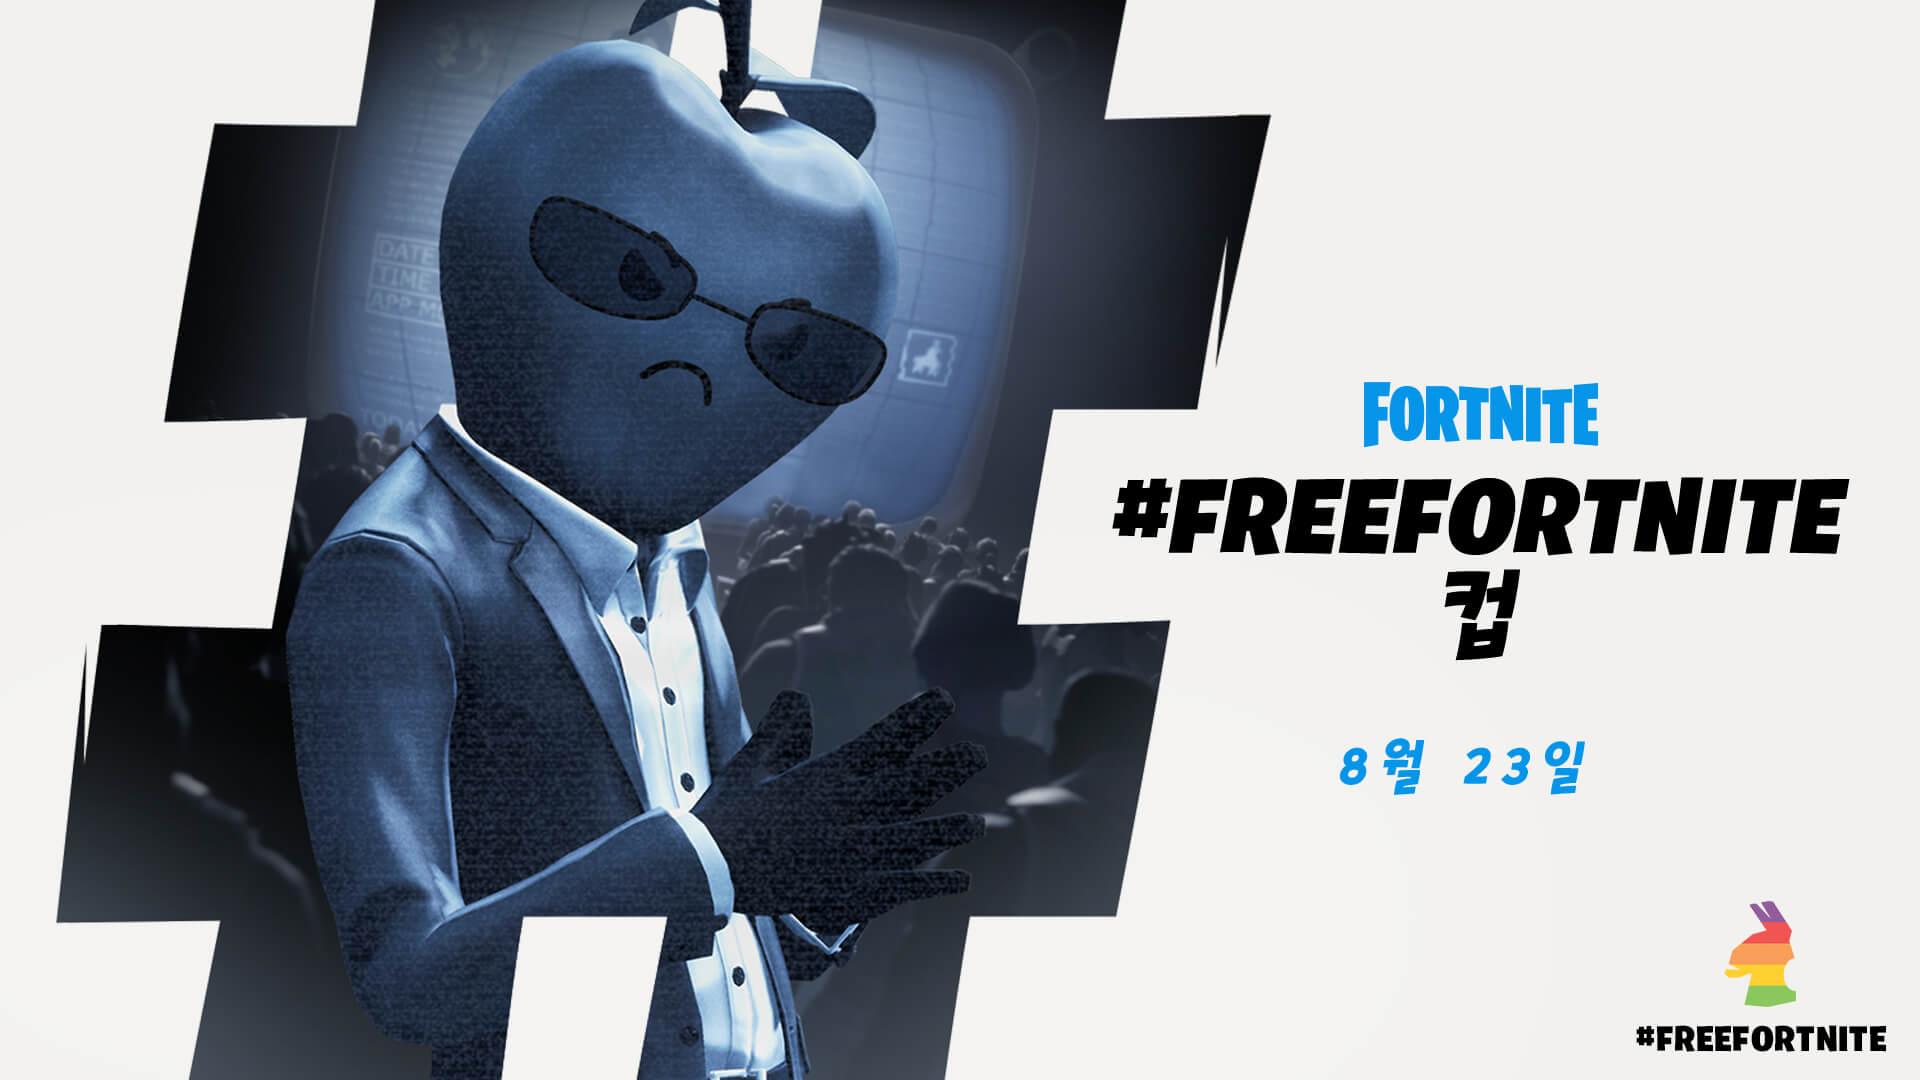 KR 13BR FreeFortniteCup Social